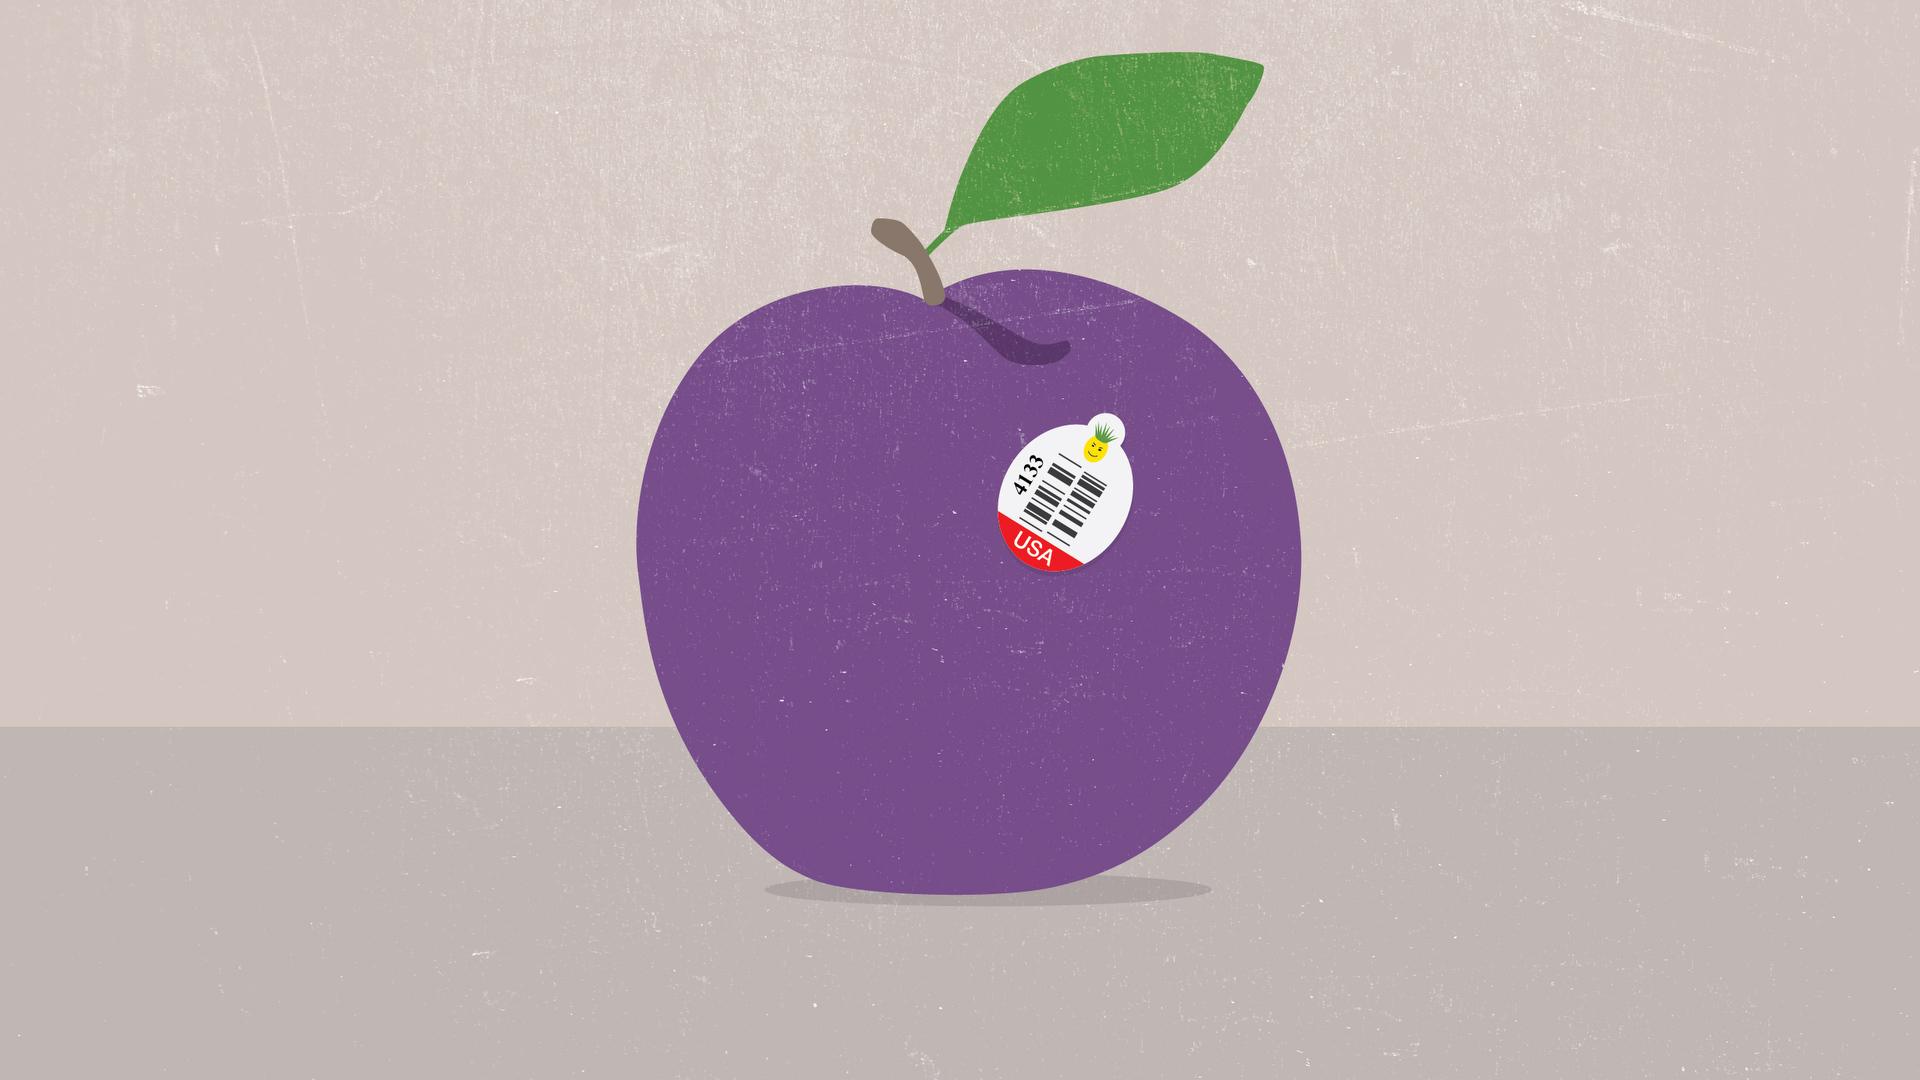 Sticker on fruit